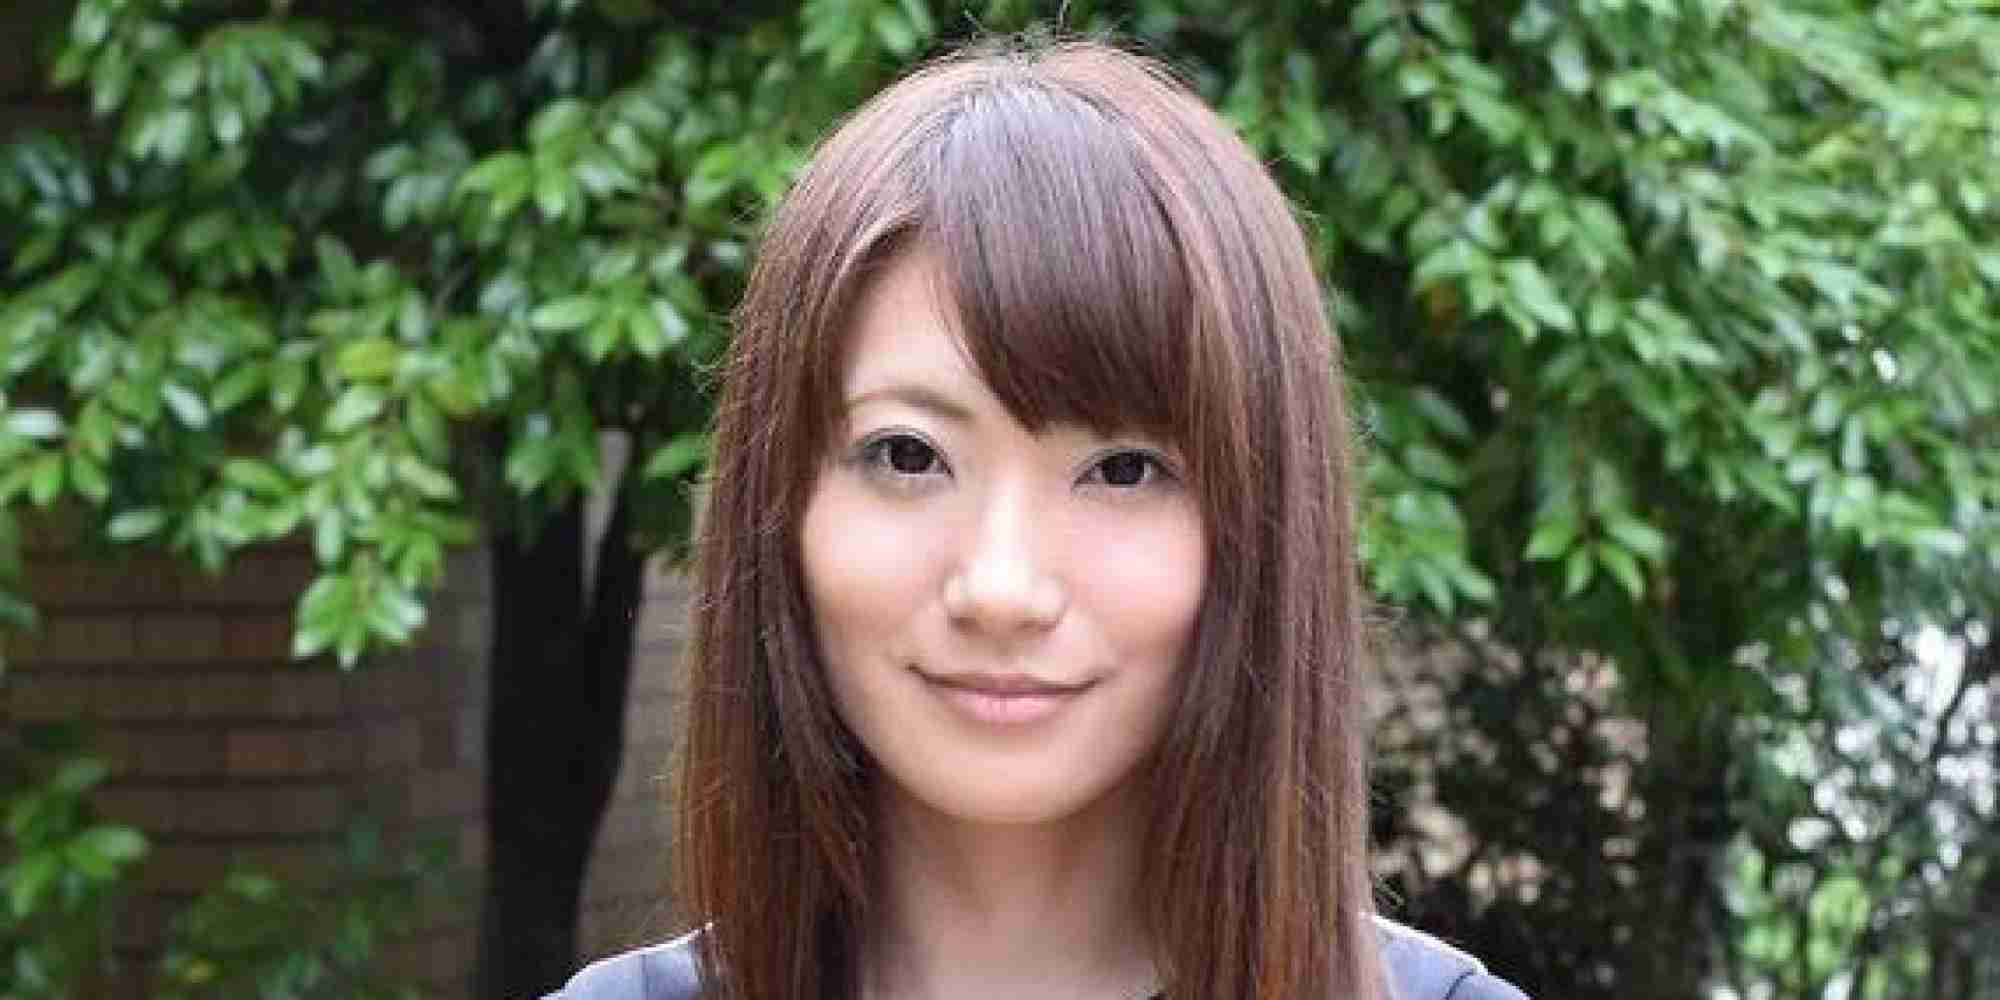 【AV強要】現役女優・香西咲が語る「洗脳」から出演までの8カ月|withnews